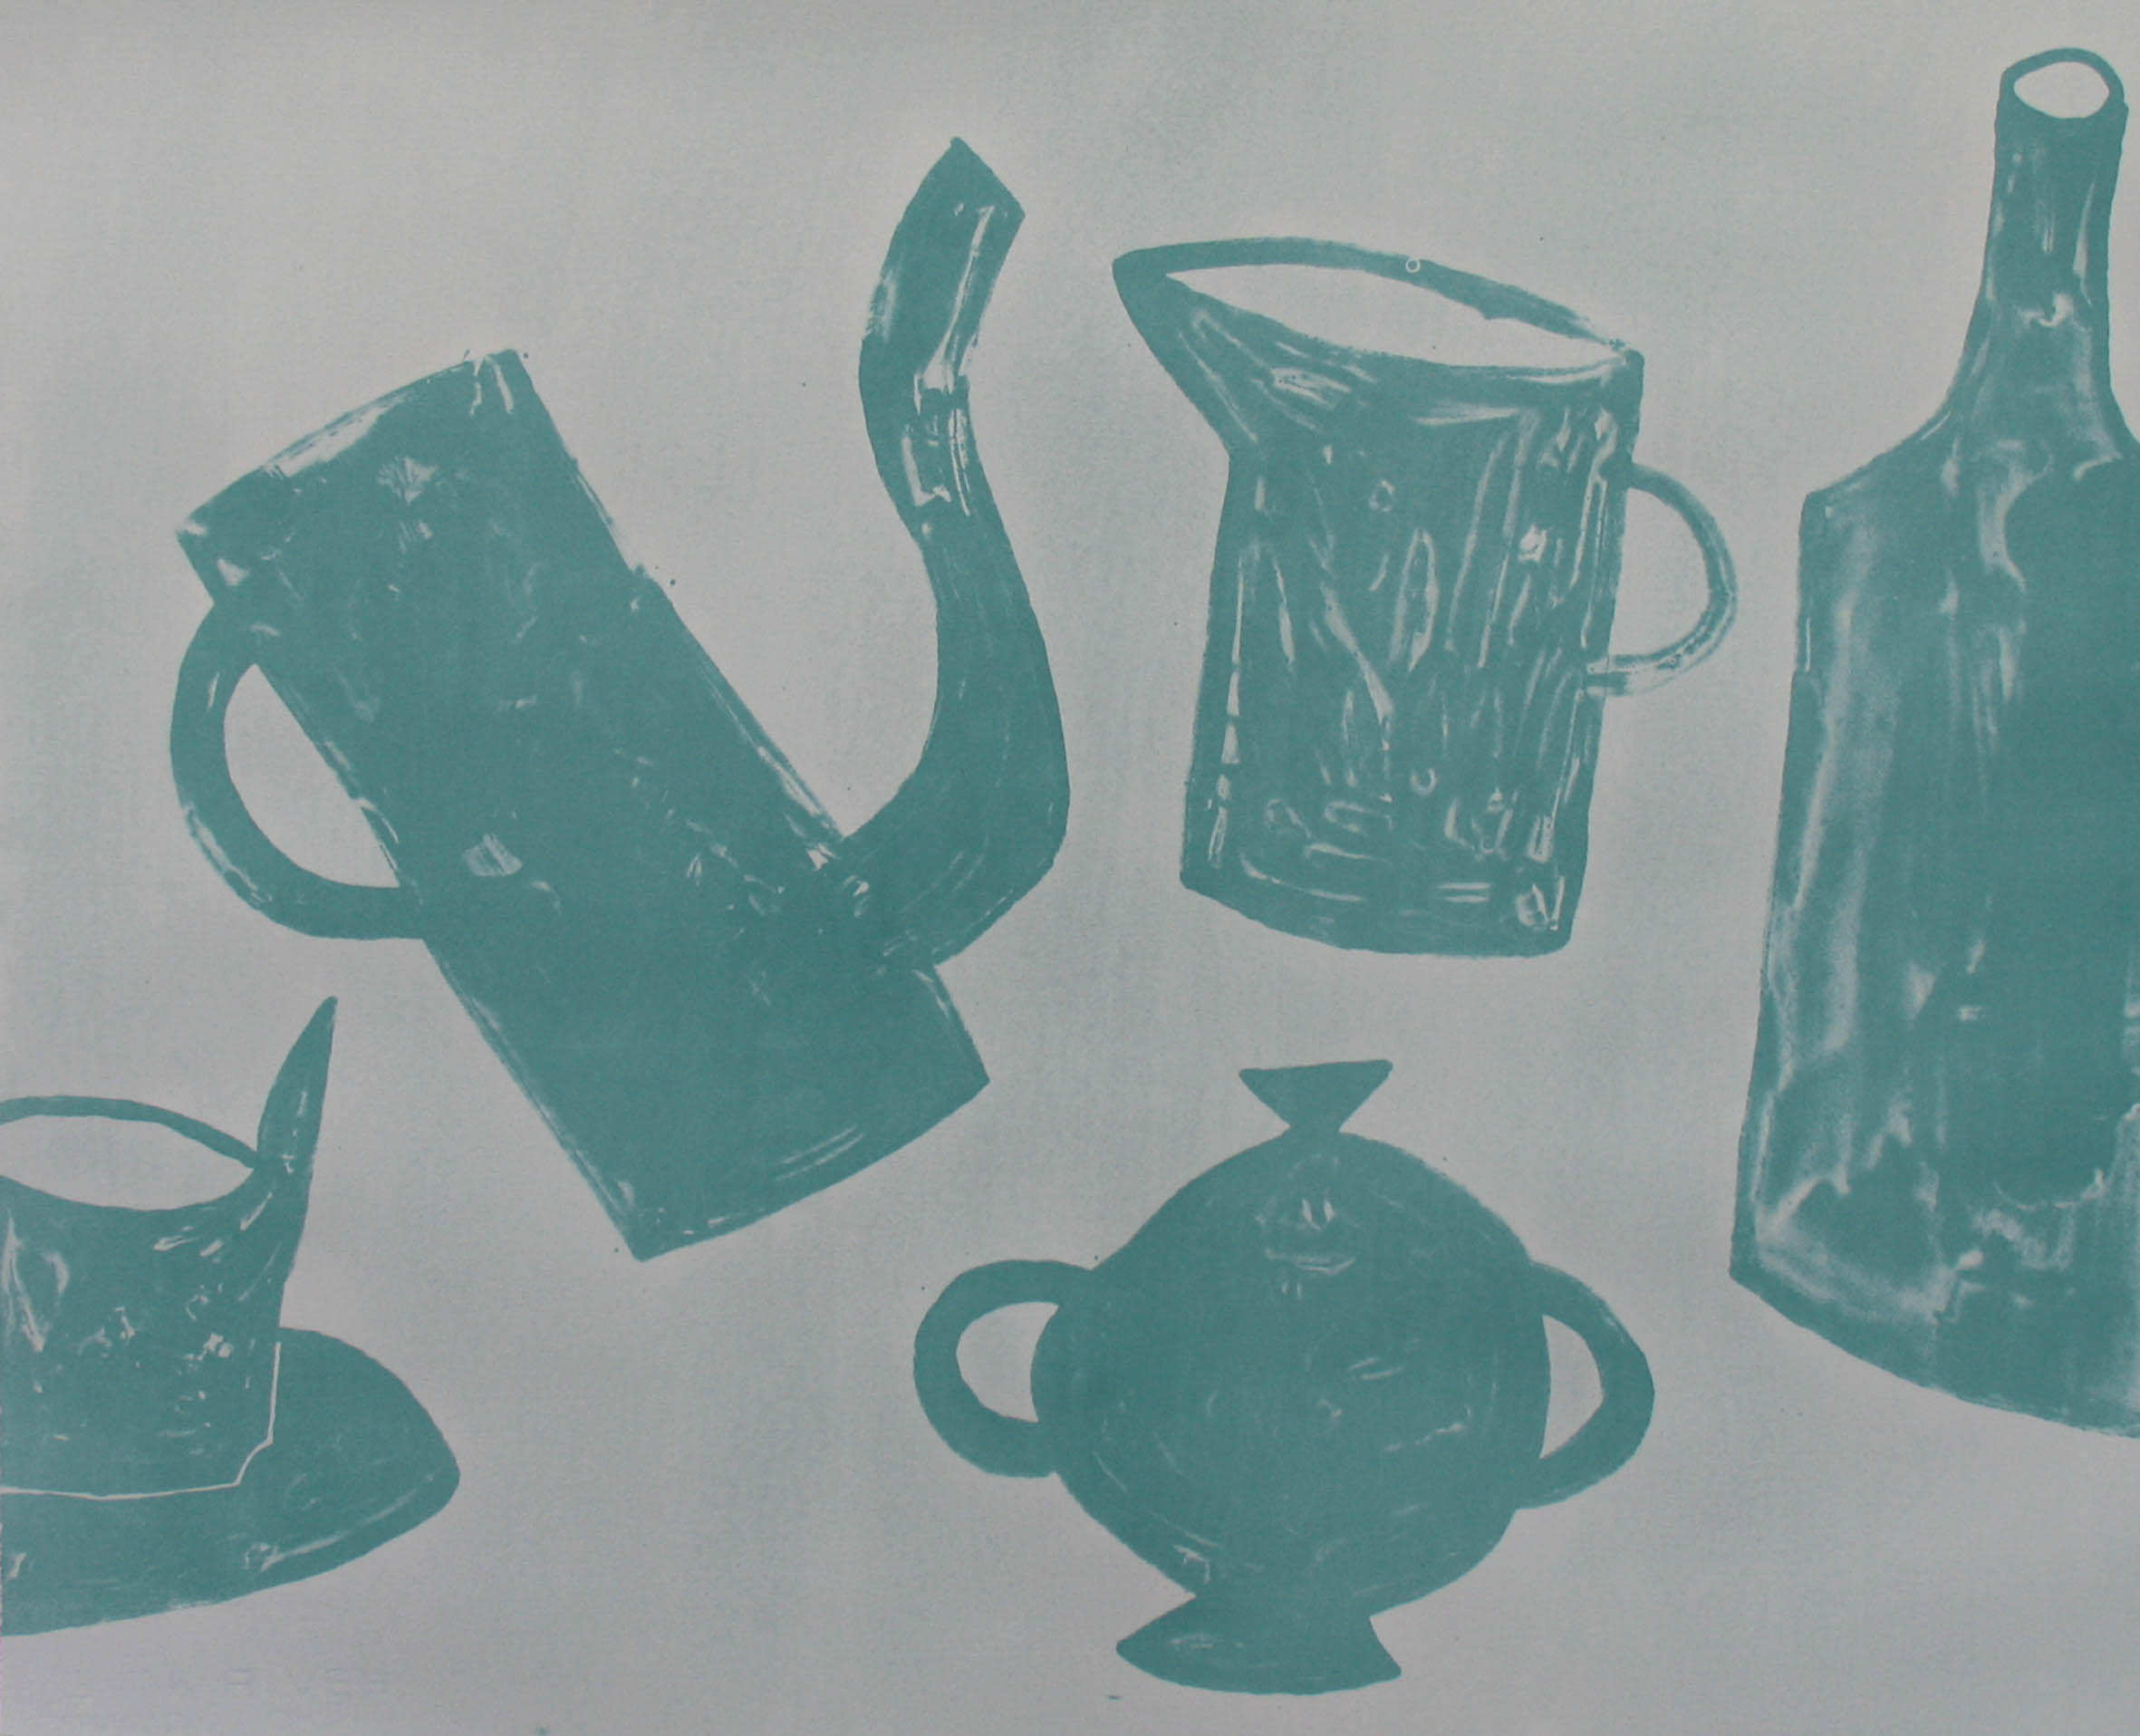 z.t. (groen servies) (2004)